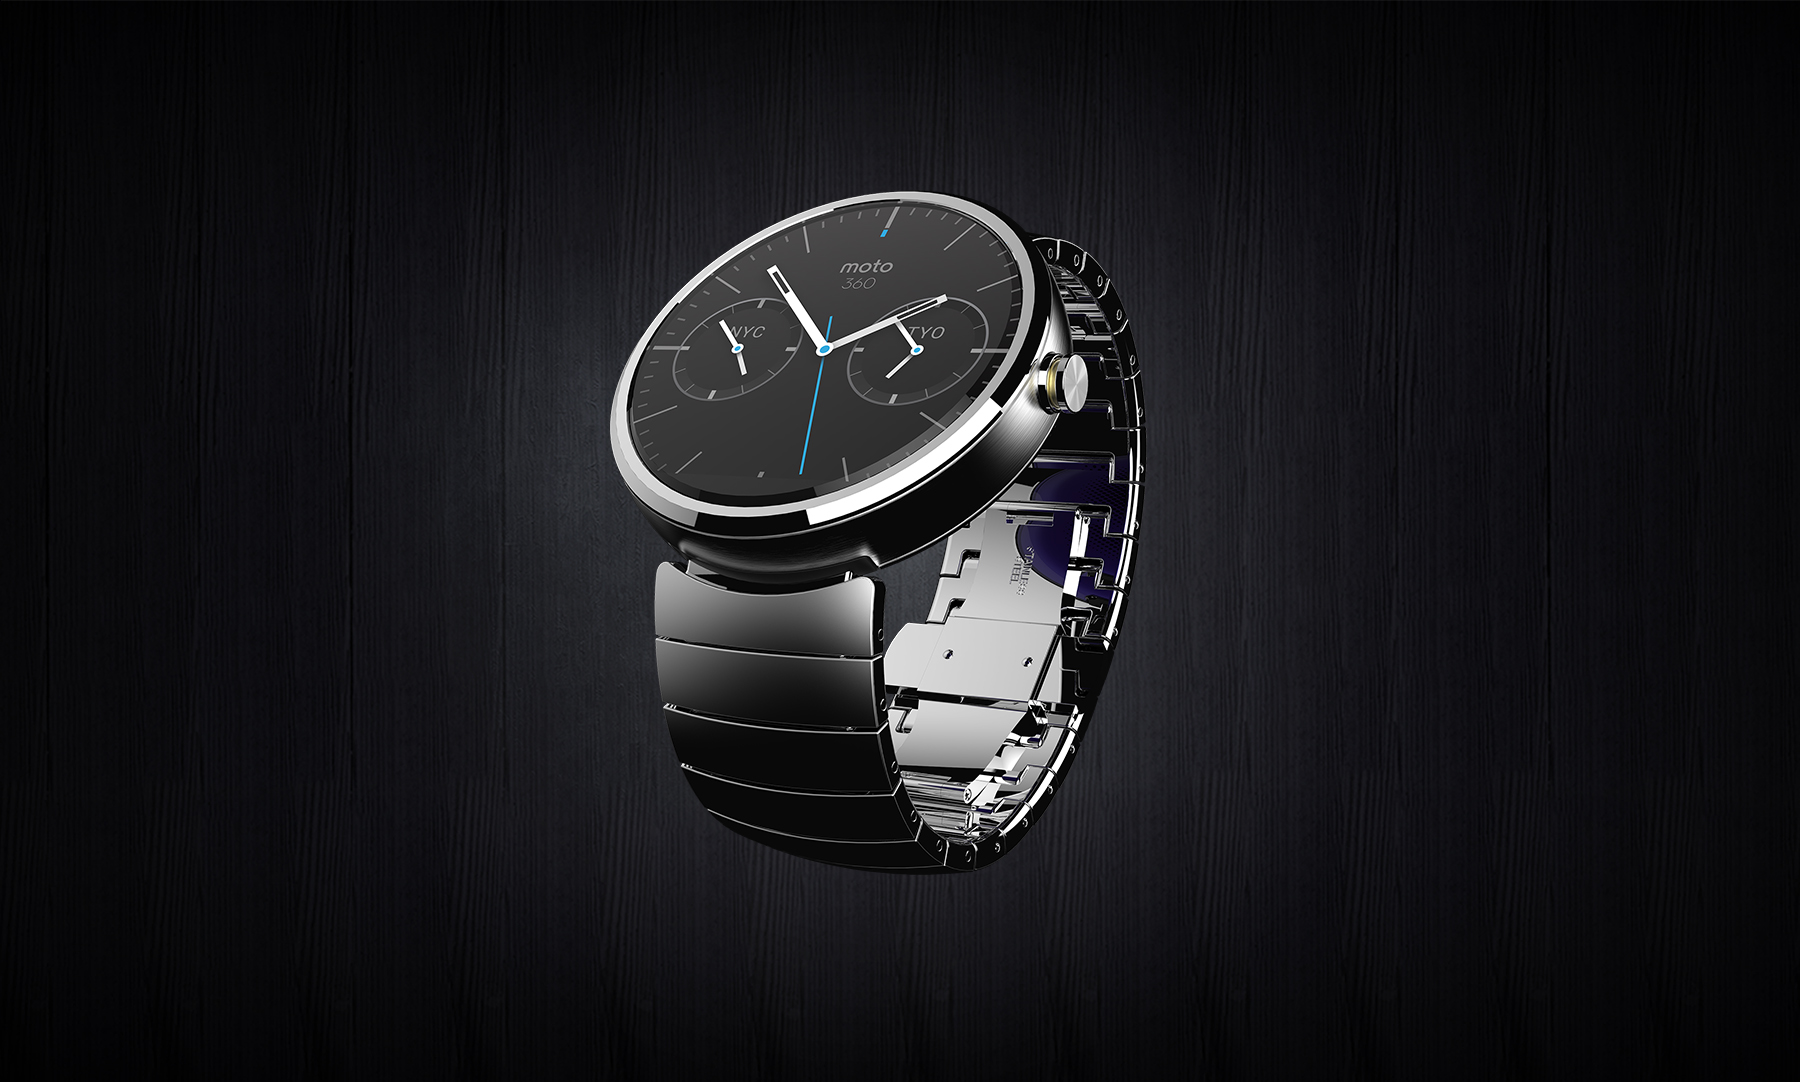 Motorola Unveils Moto 360 Android Wear Smartwatch